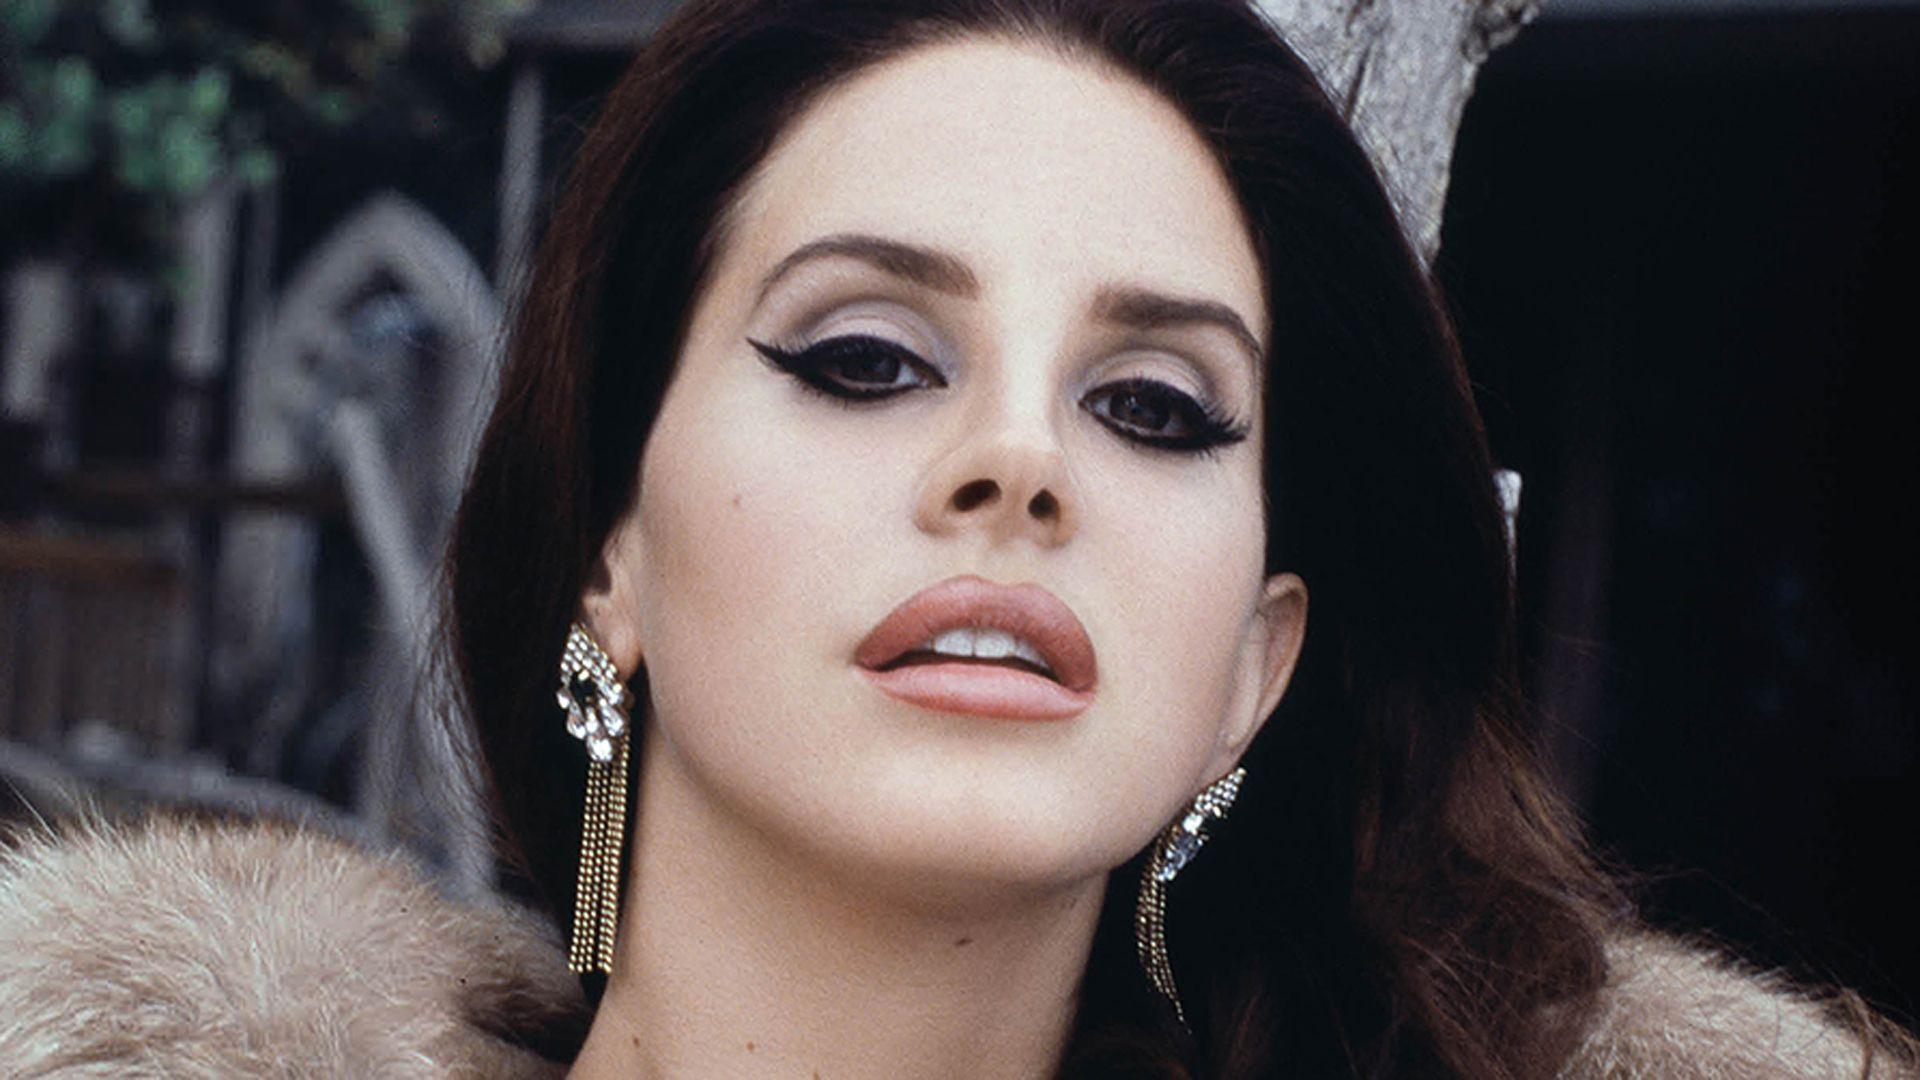 Lana Lana Del Rey Wallpaper 40960503 Fanpop Page 9